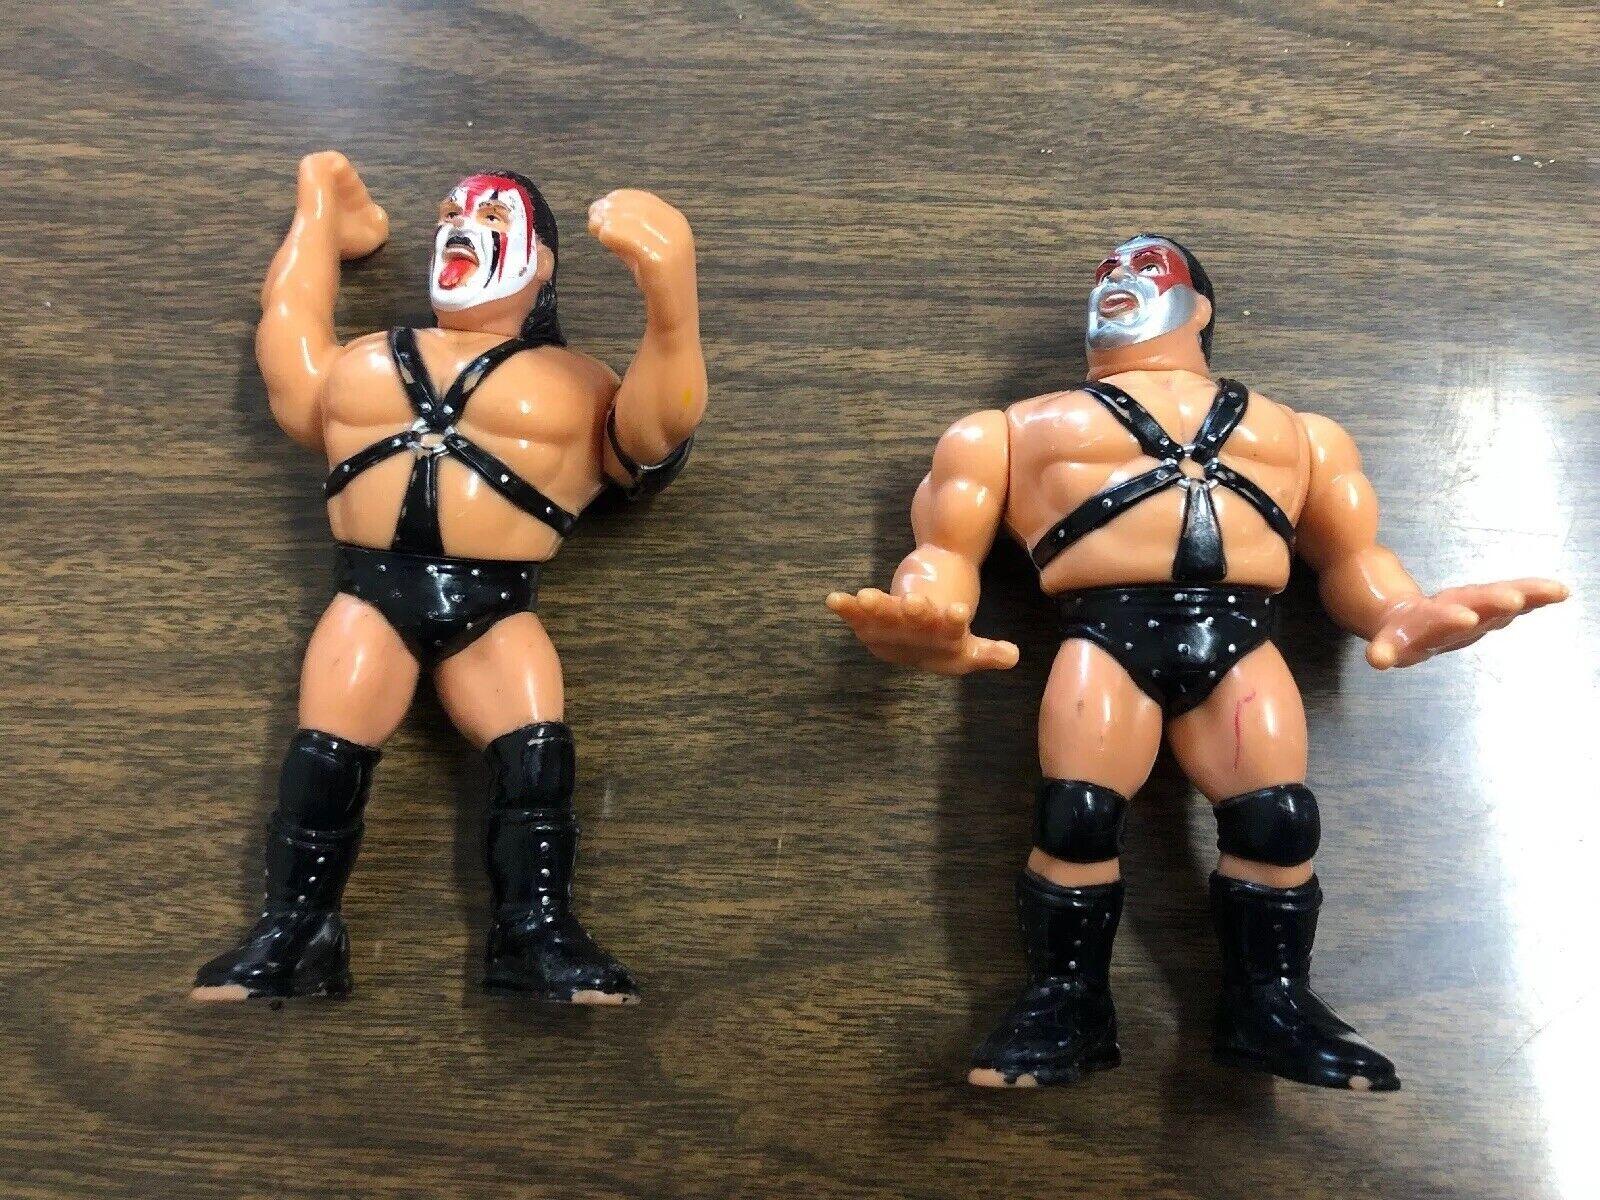 Demolition Crush & Smash WWF Wrestling Action Figure Hasbro